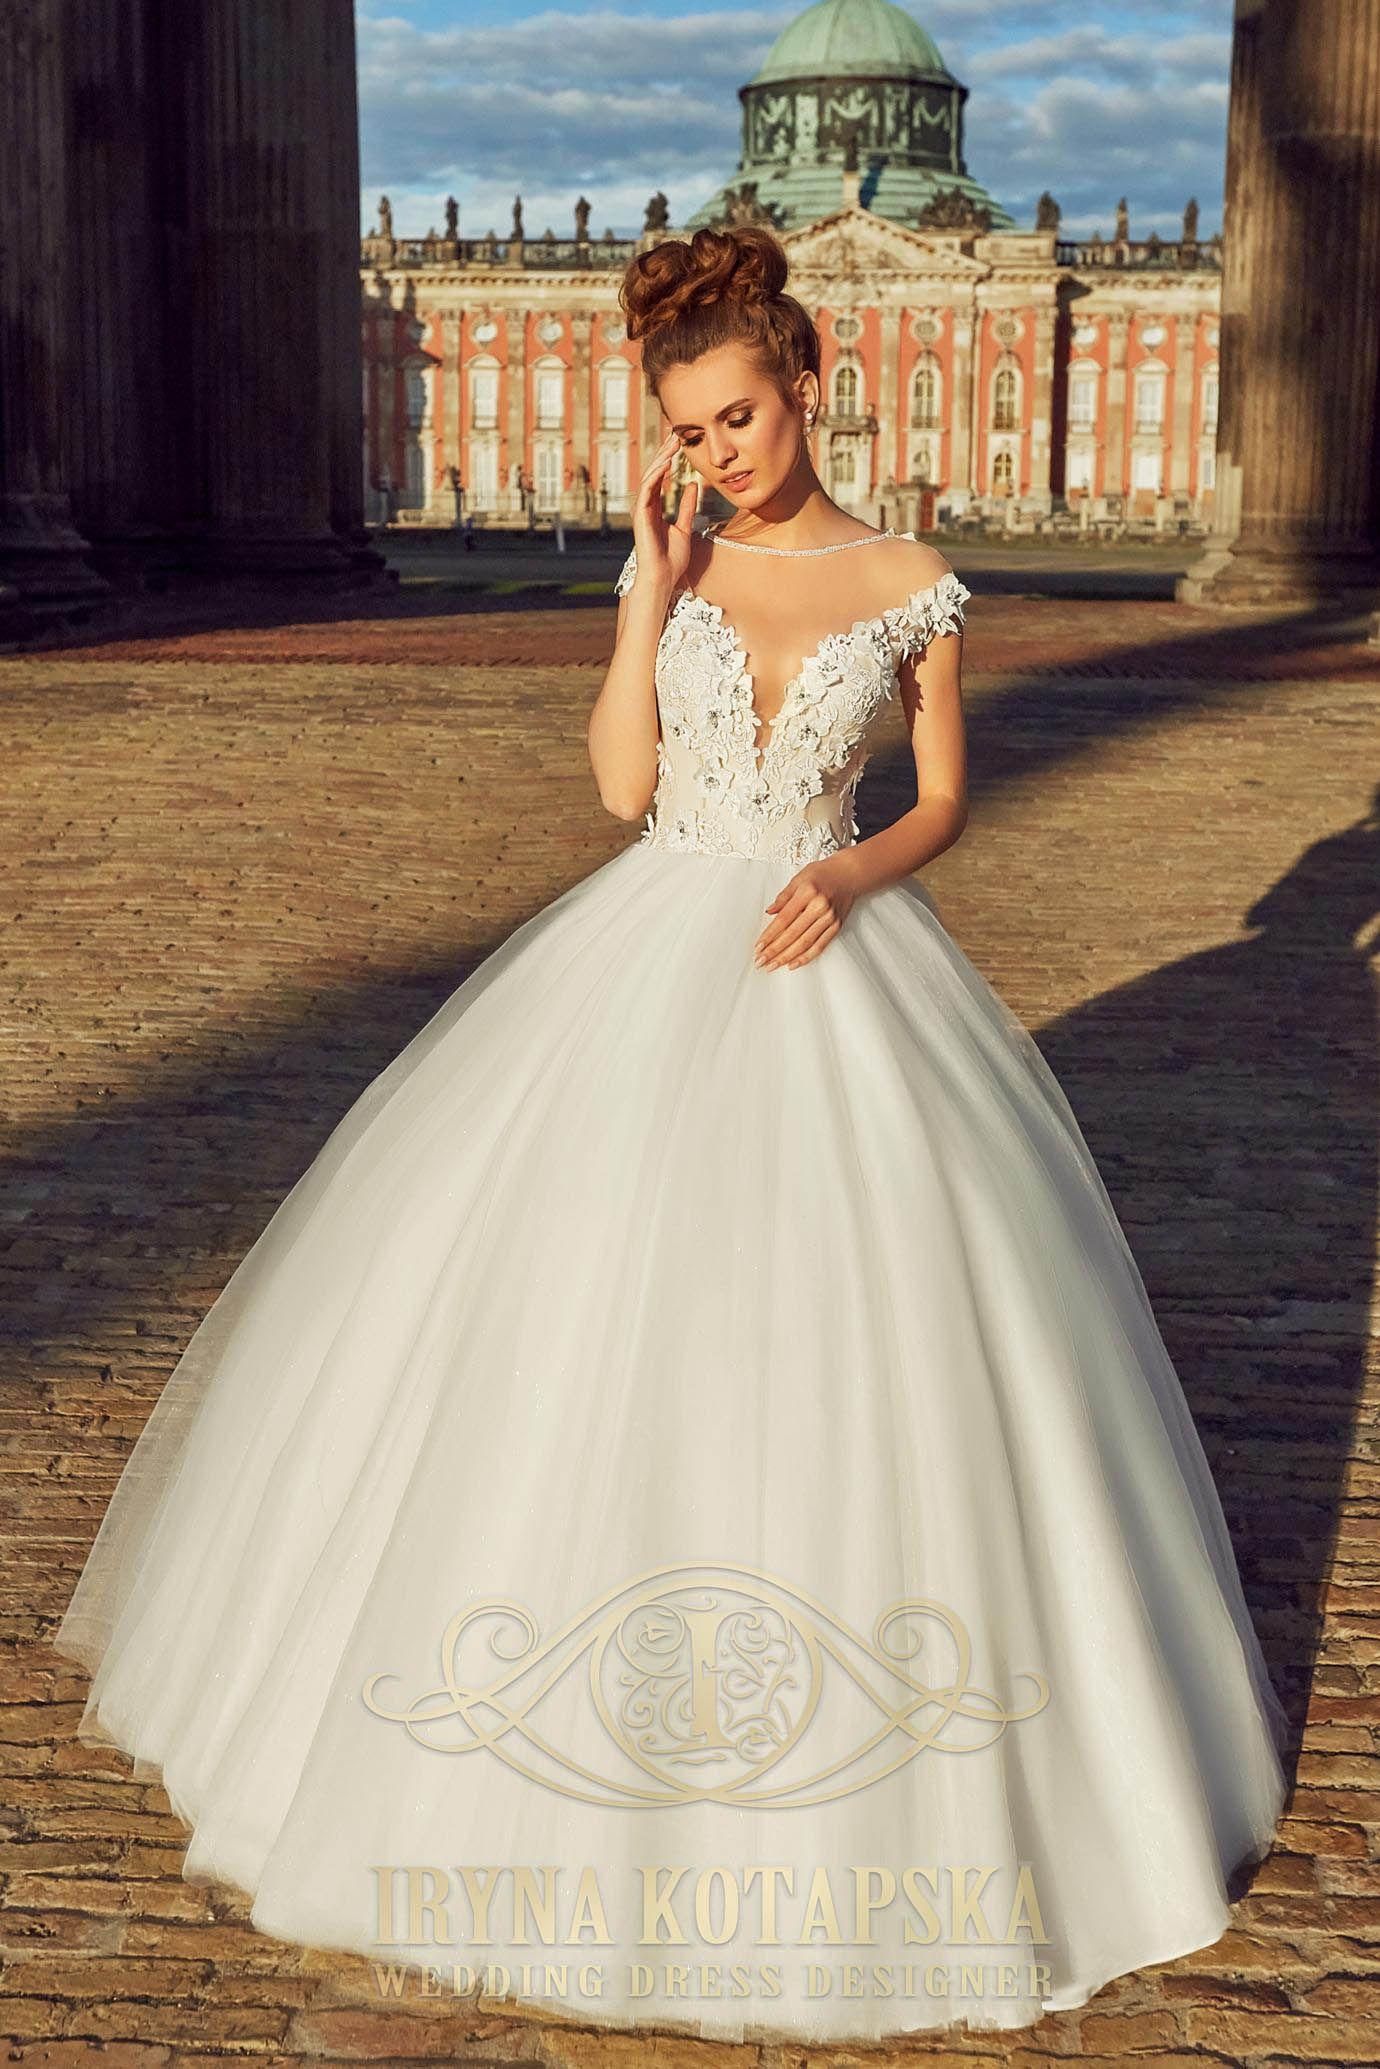 Wedding Dress Pearls And Precious Stones